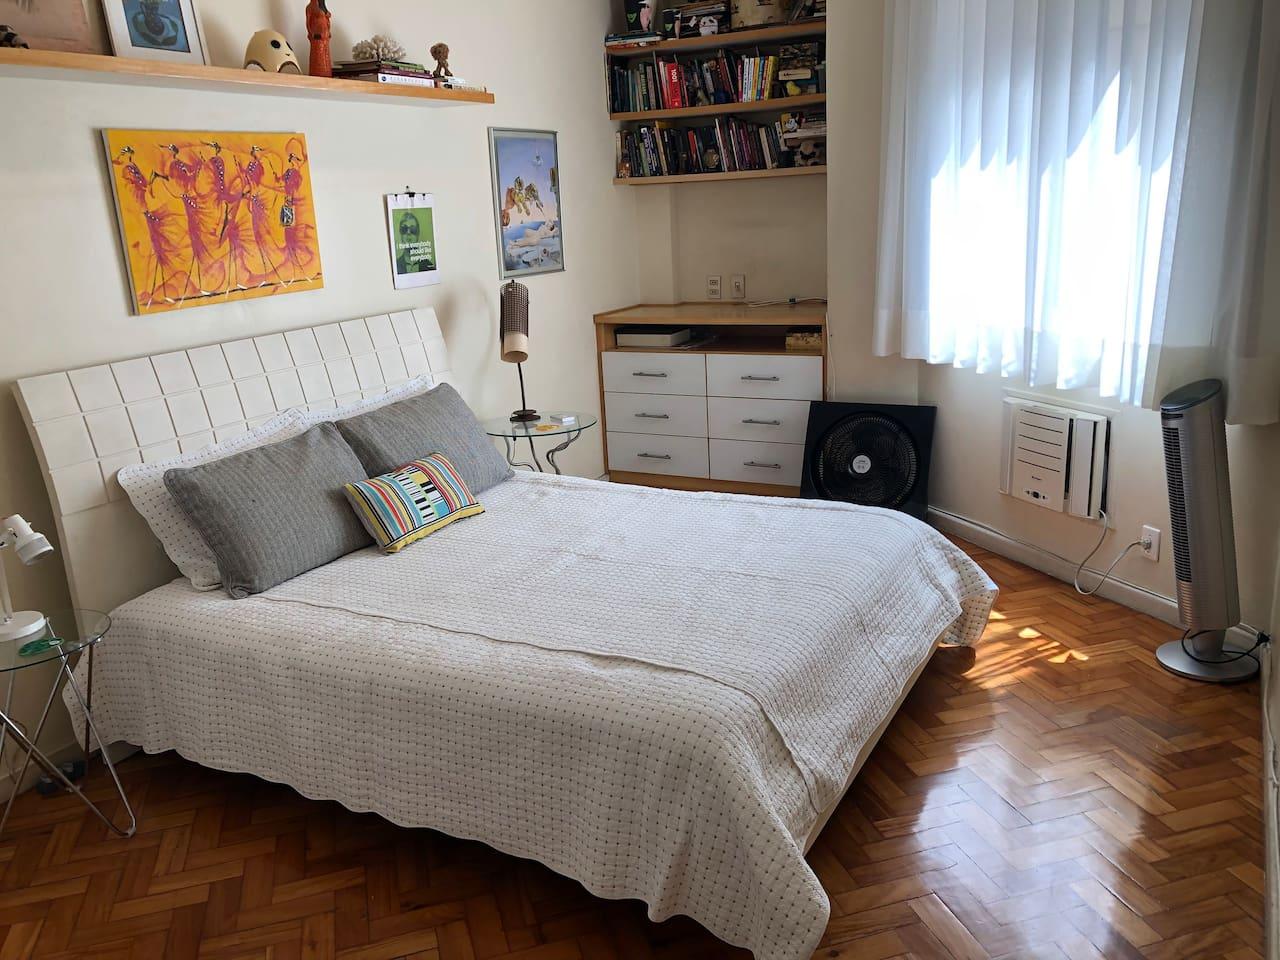 Quarto confortável, silencioso e espaçoso (16 m2) com cama queen-size. / Comfortable, quiet and spacious bedroom (174 sq ft) with queen-size bed.